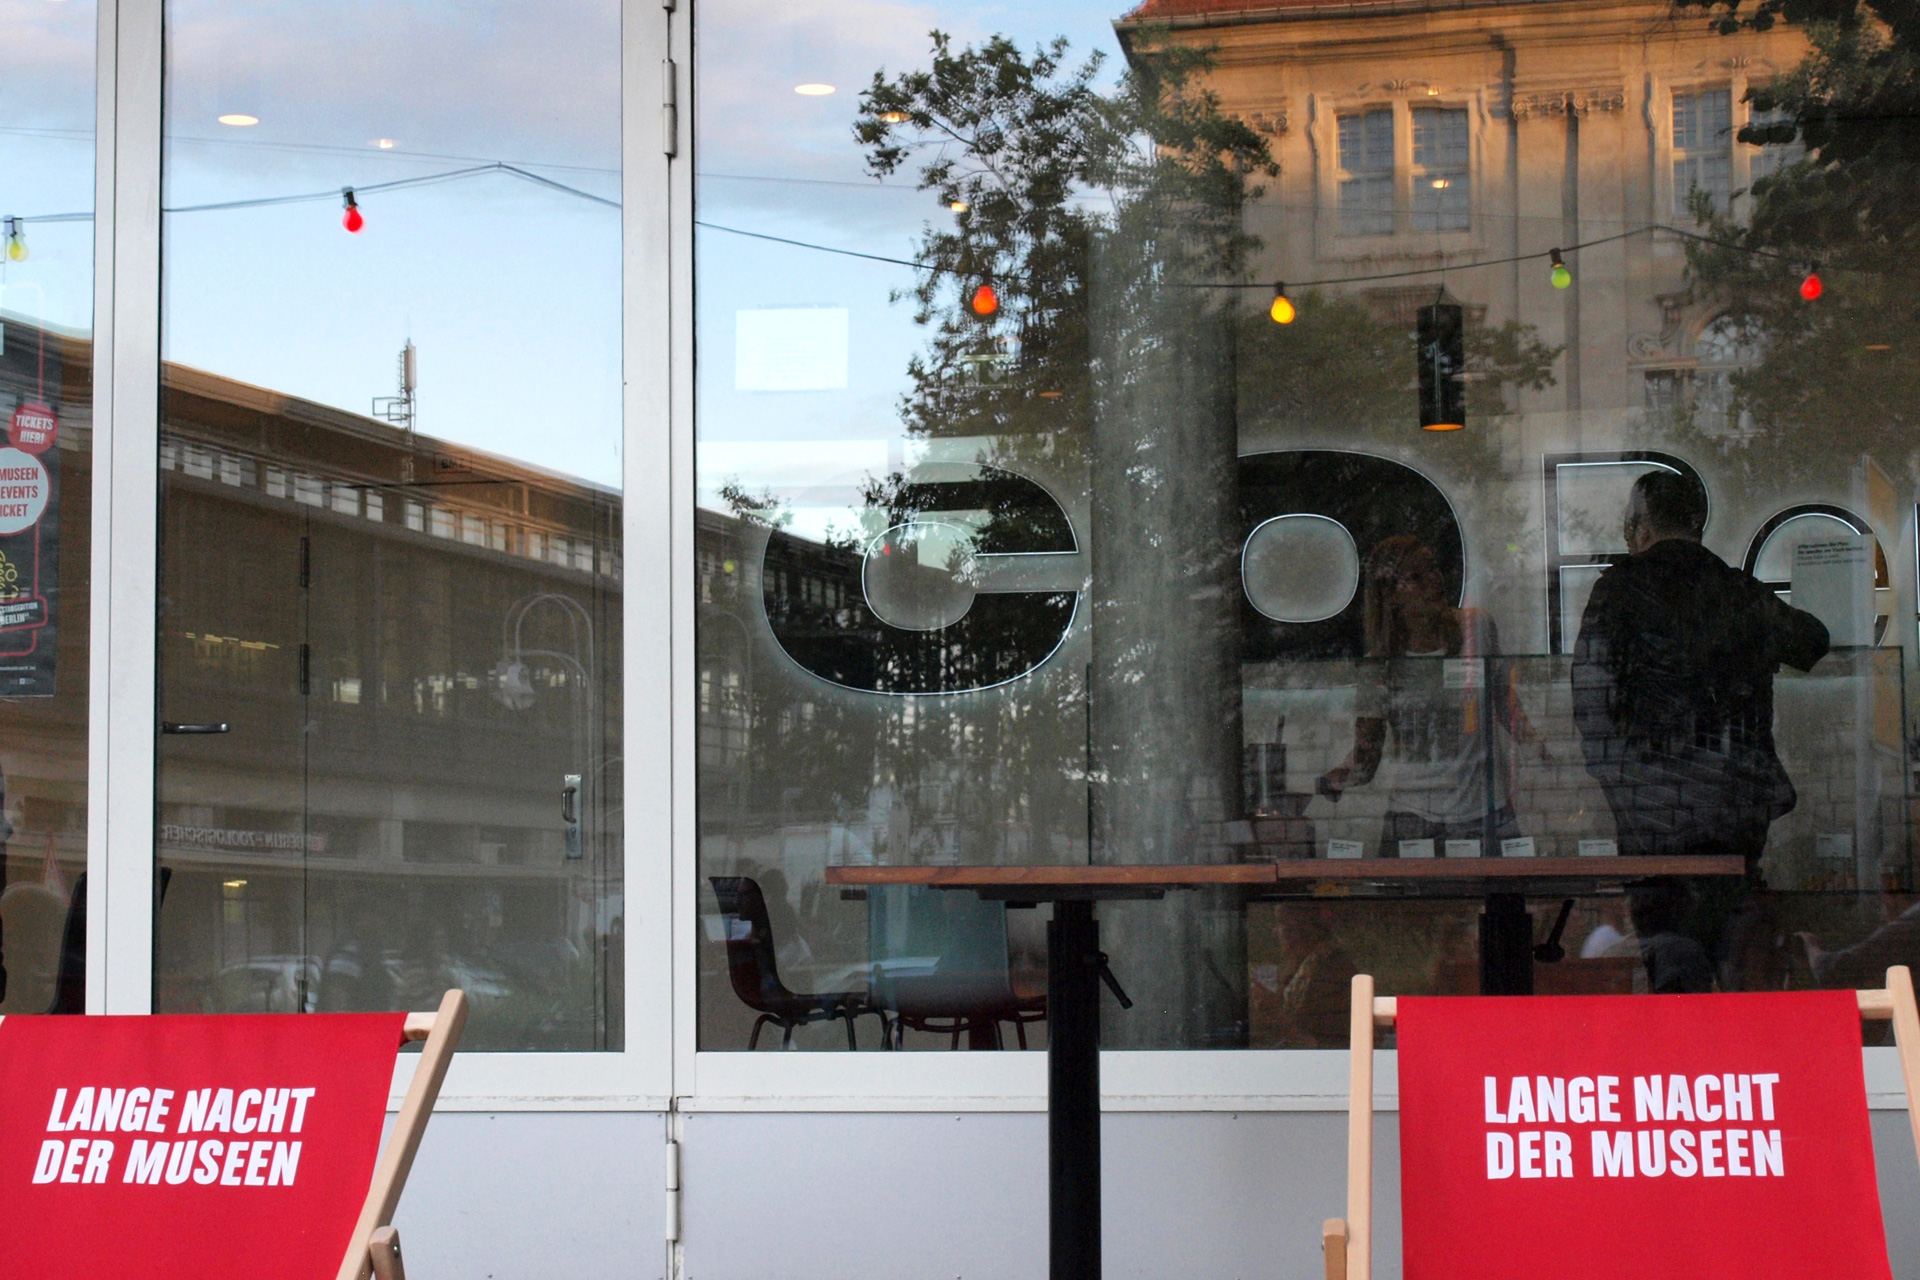 buchstabenplus: c/o Berlin